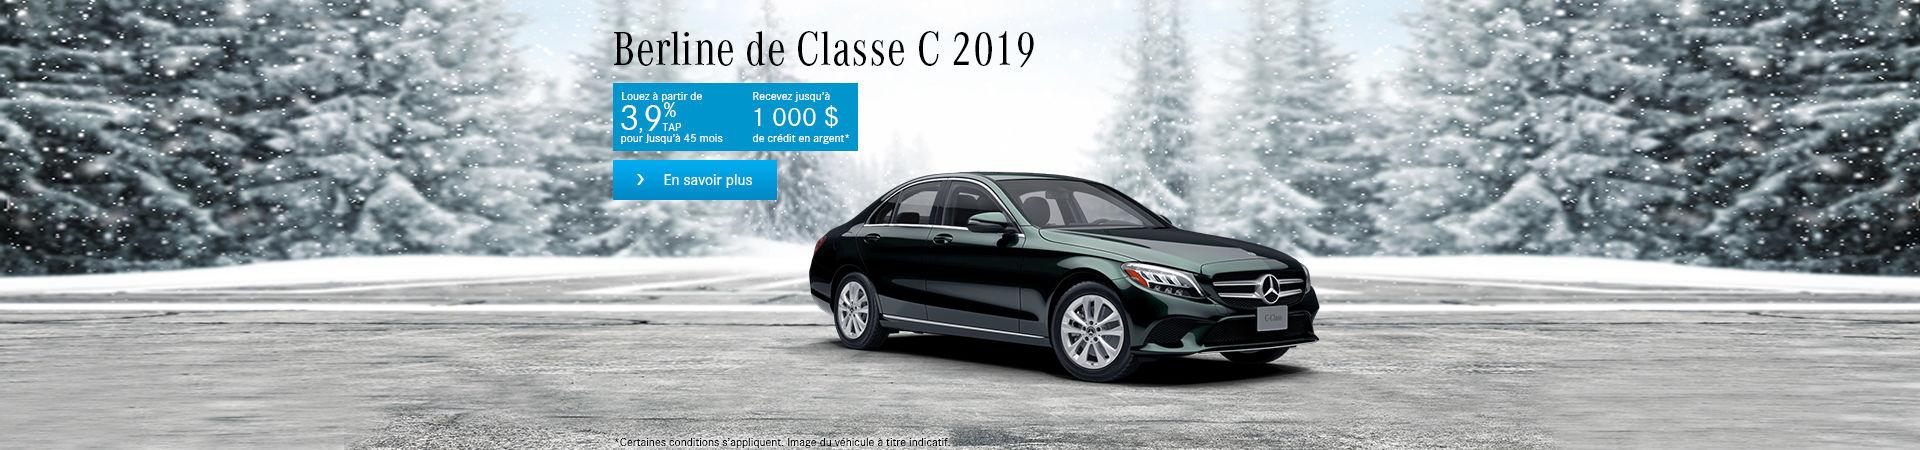 Classe C Berline 2019